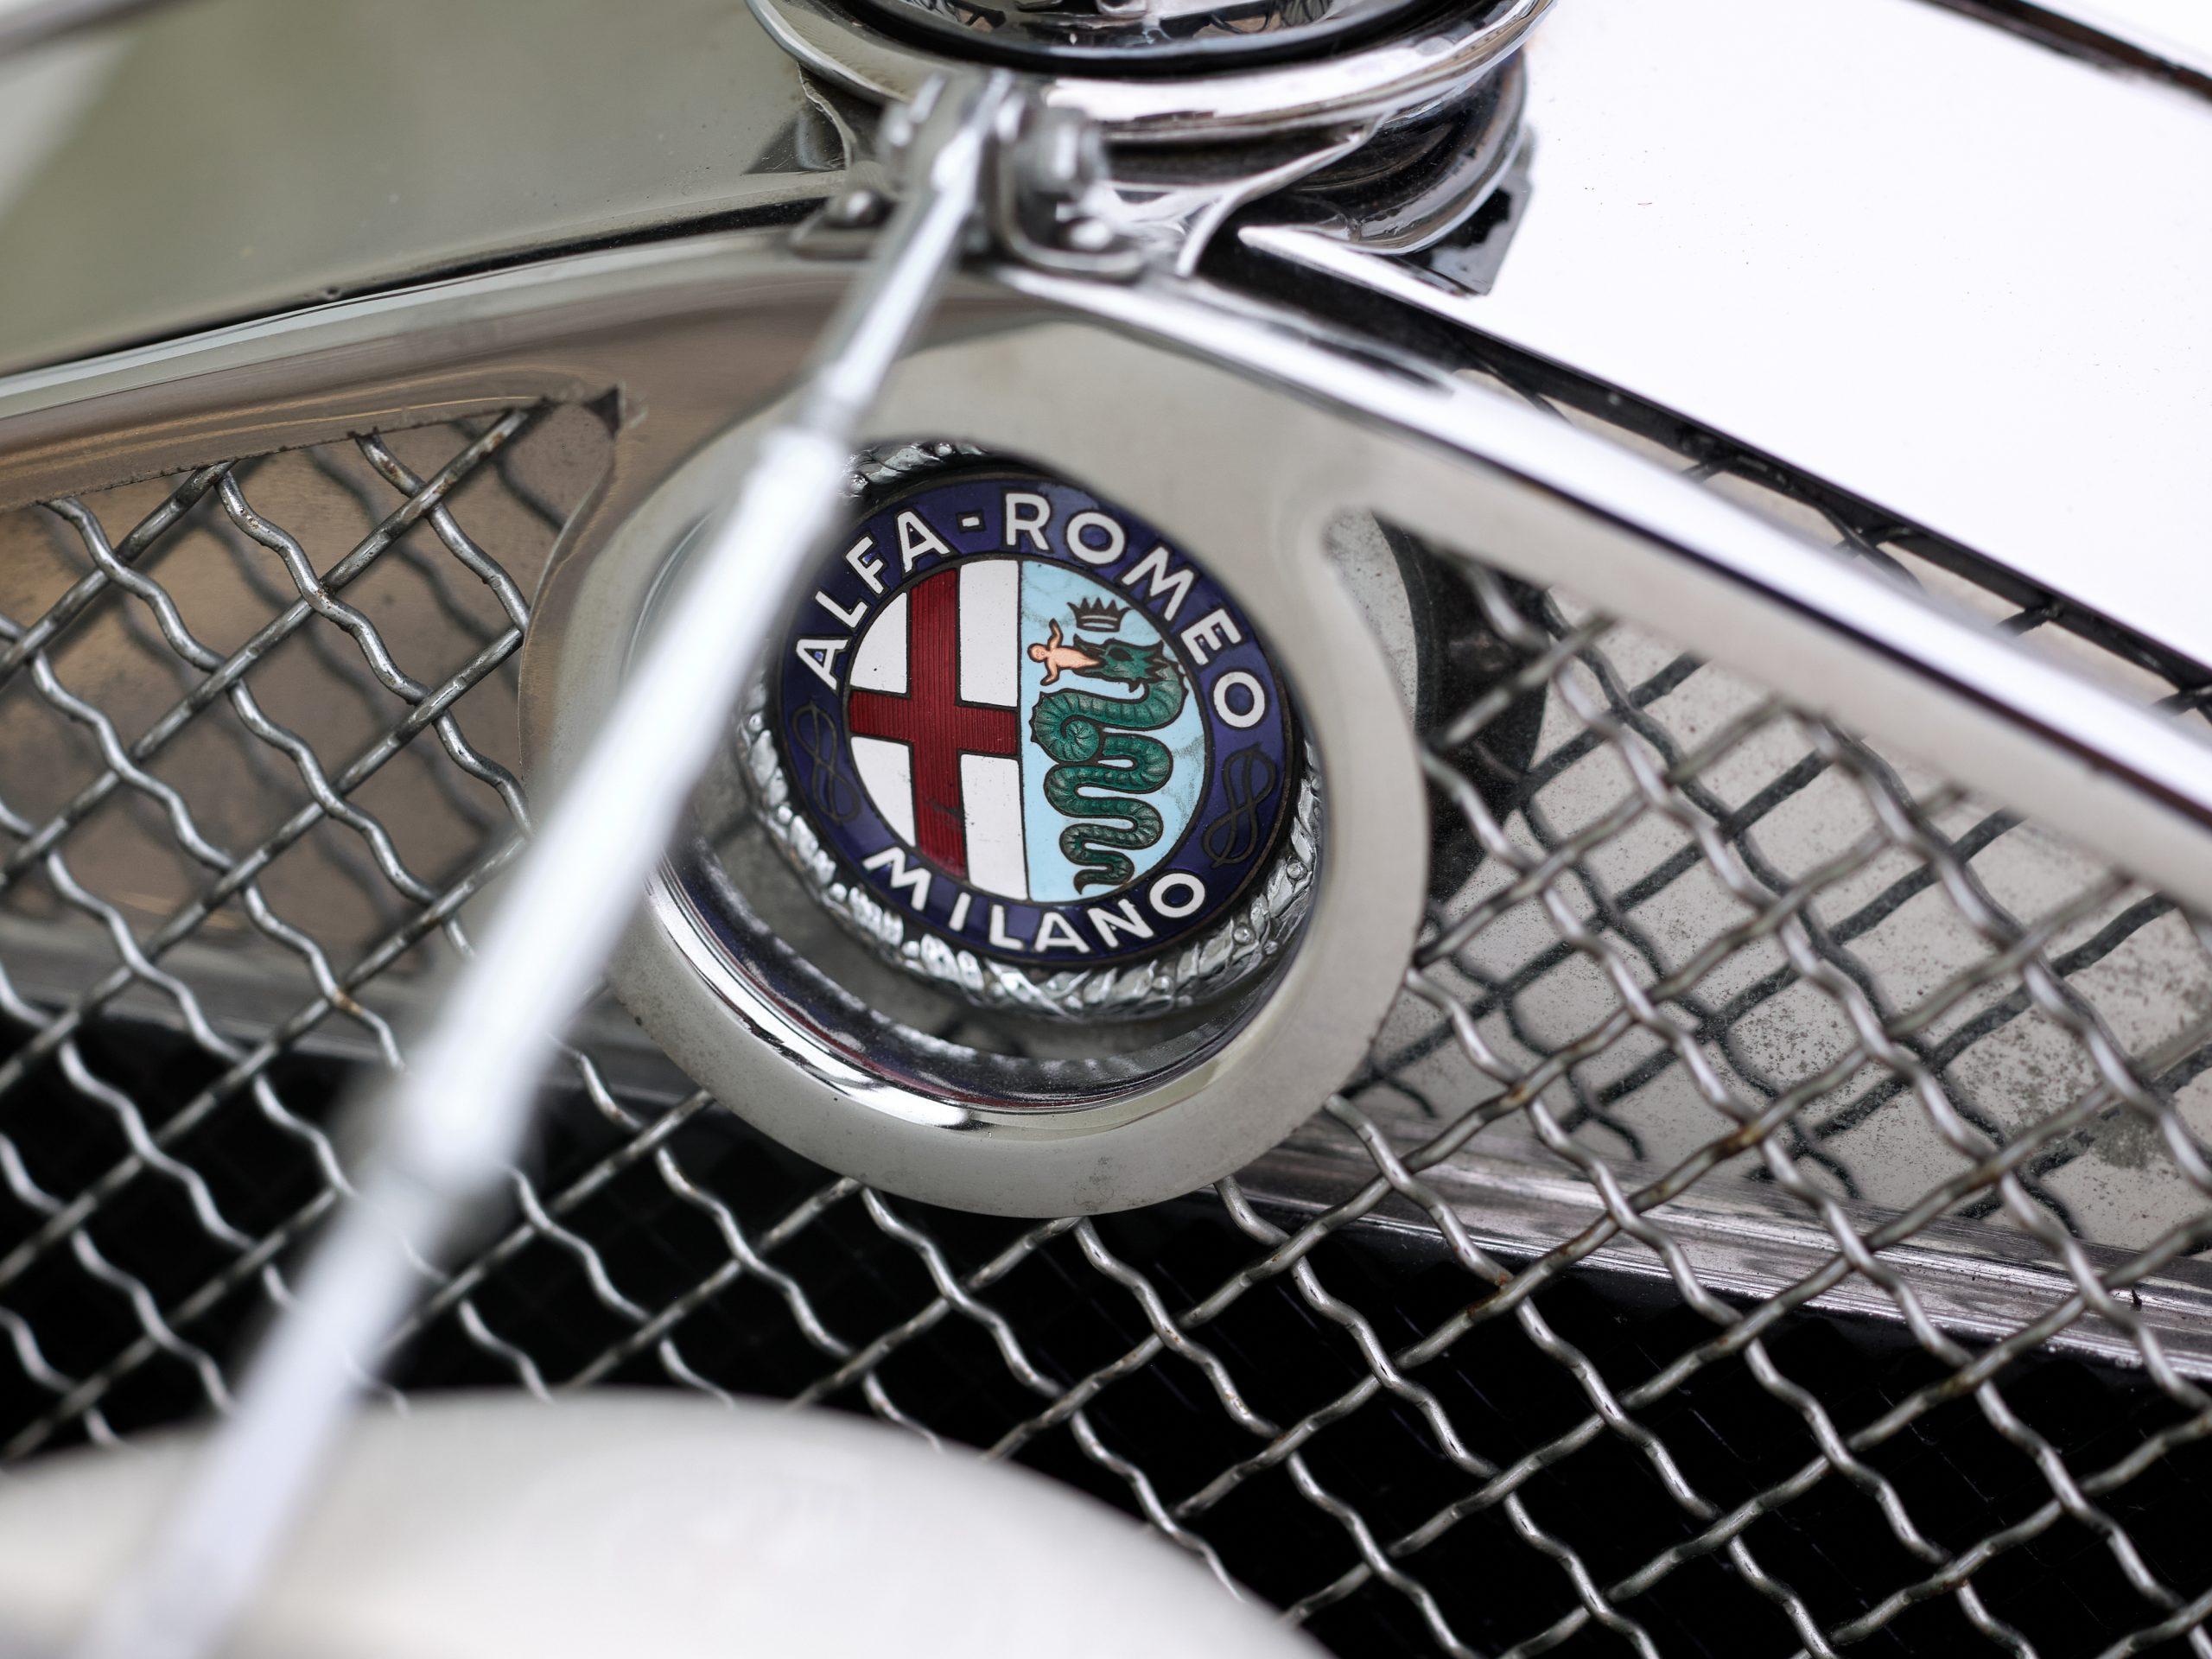 1930 Alfa Romeo 6C 1750 Grand Sport Spider by Zagato hood logo